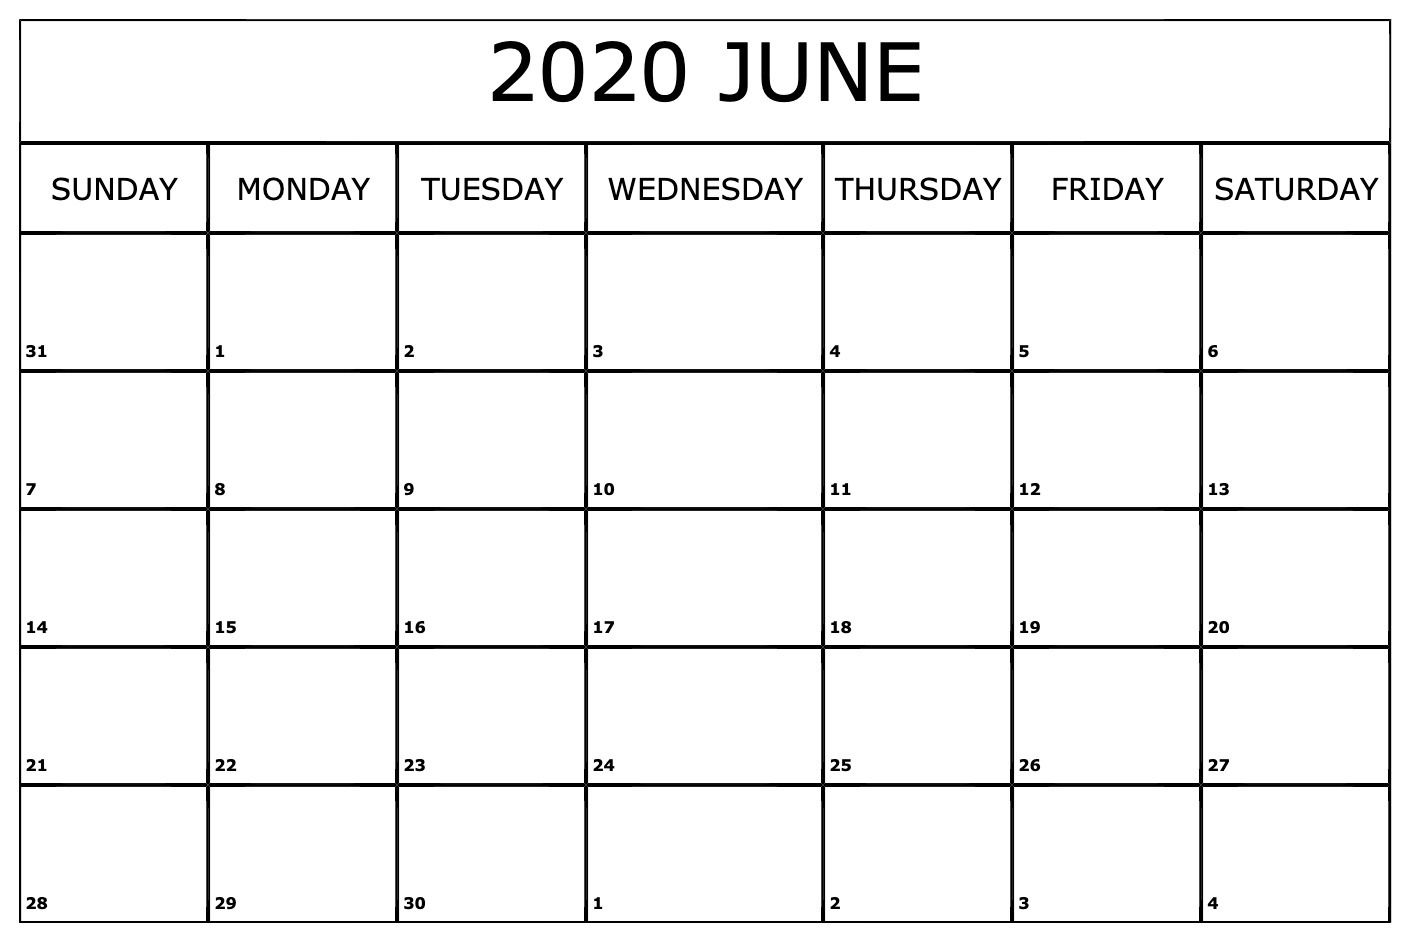 Printable Calendar June 2020.June 2020 Calendar Printable Monthly Calendar Template